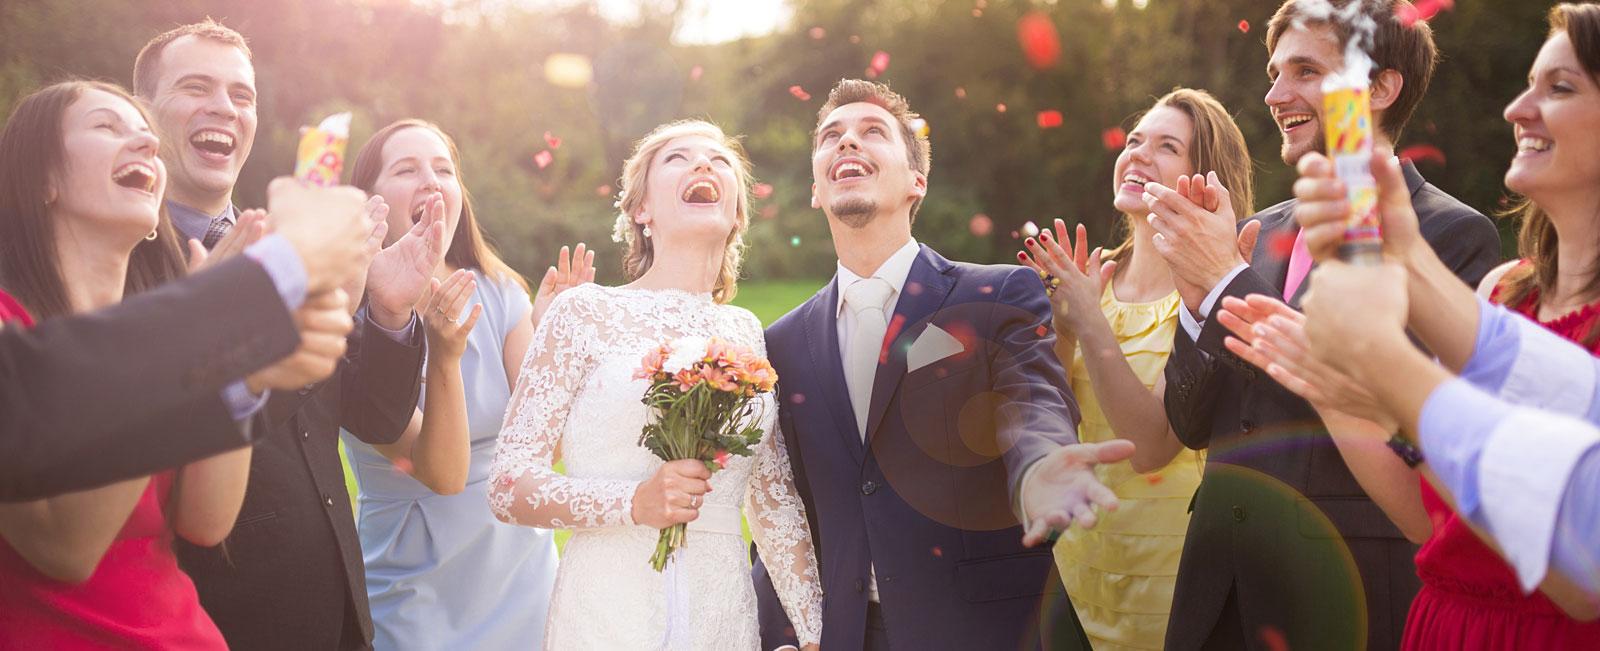 wedding-party1